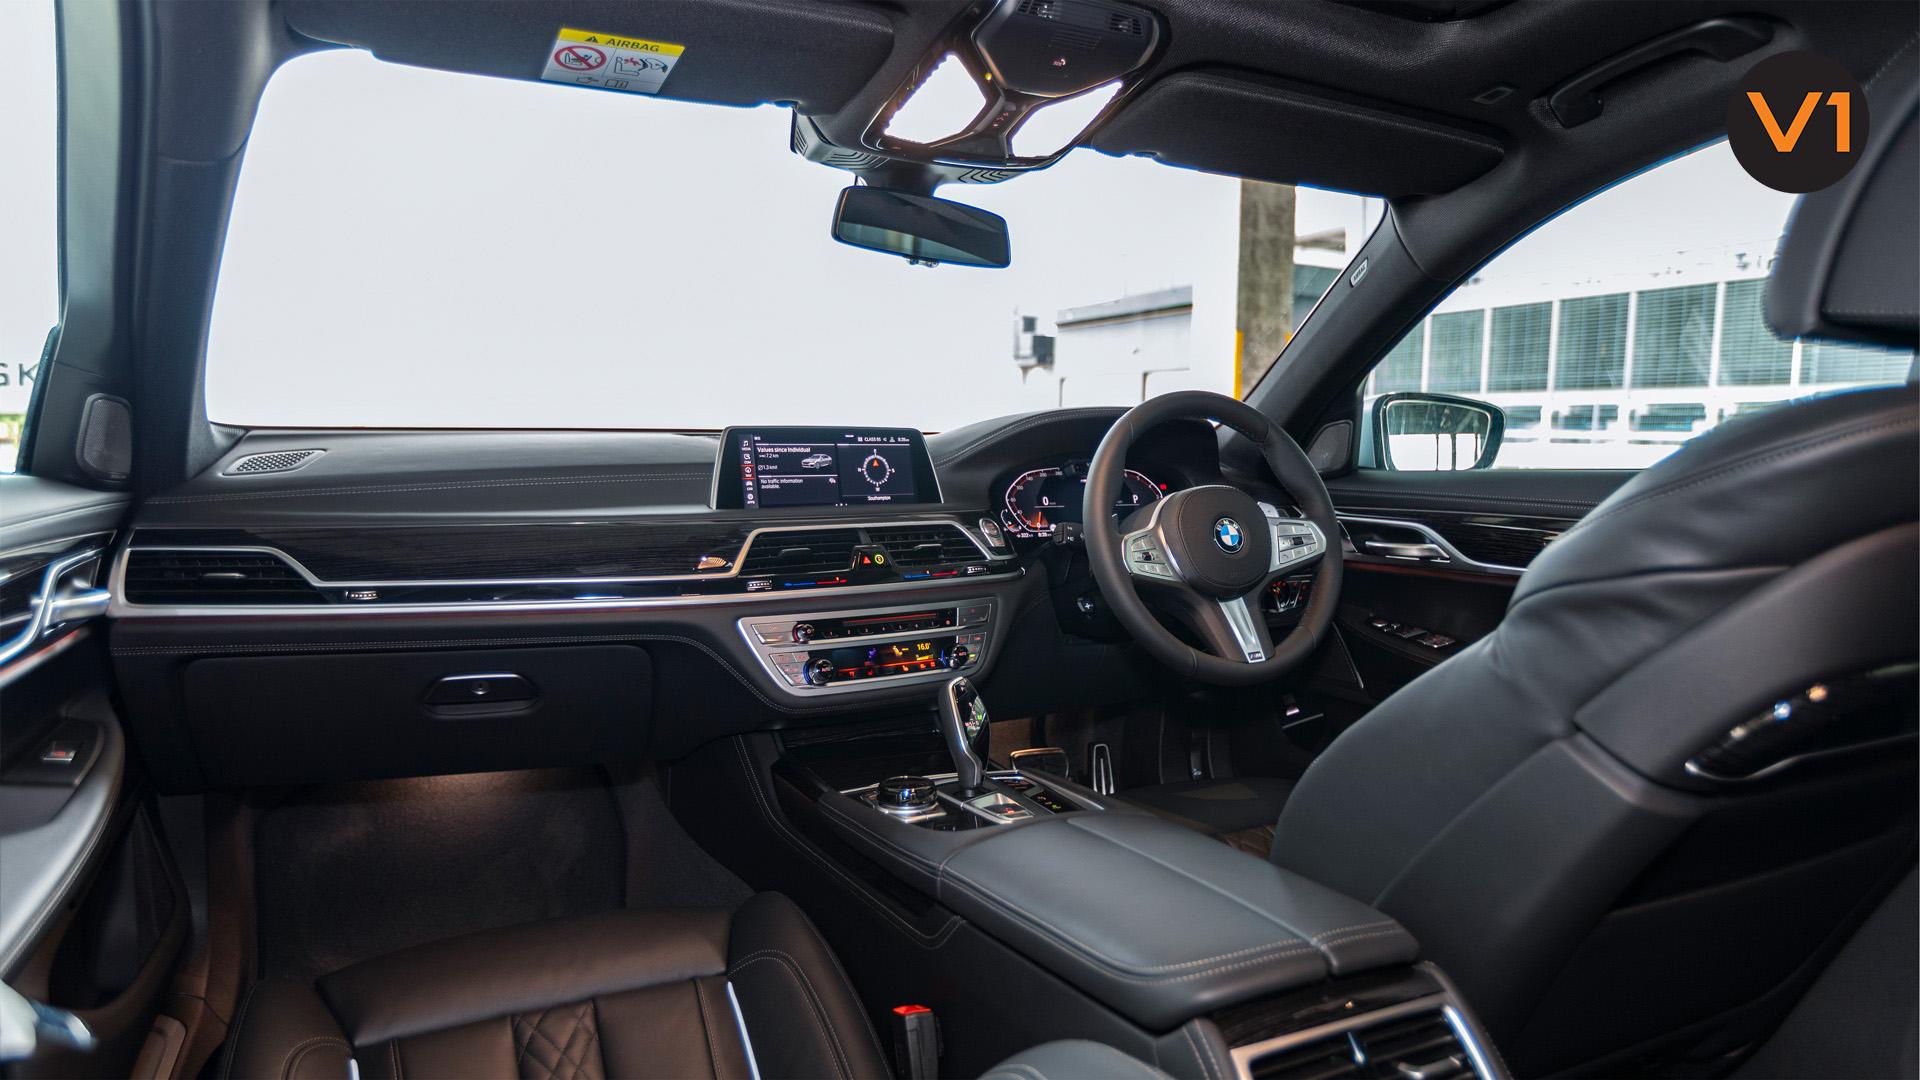 BMW 740LI M Sport Saloon - Front Interior